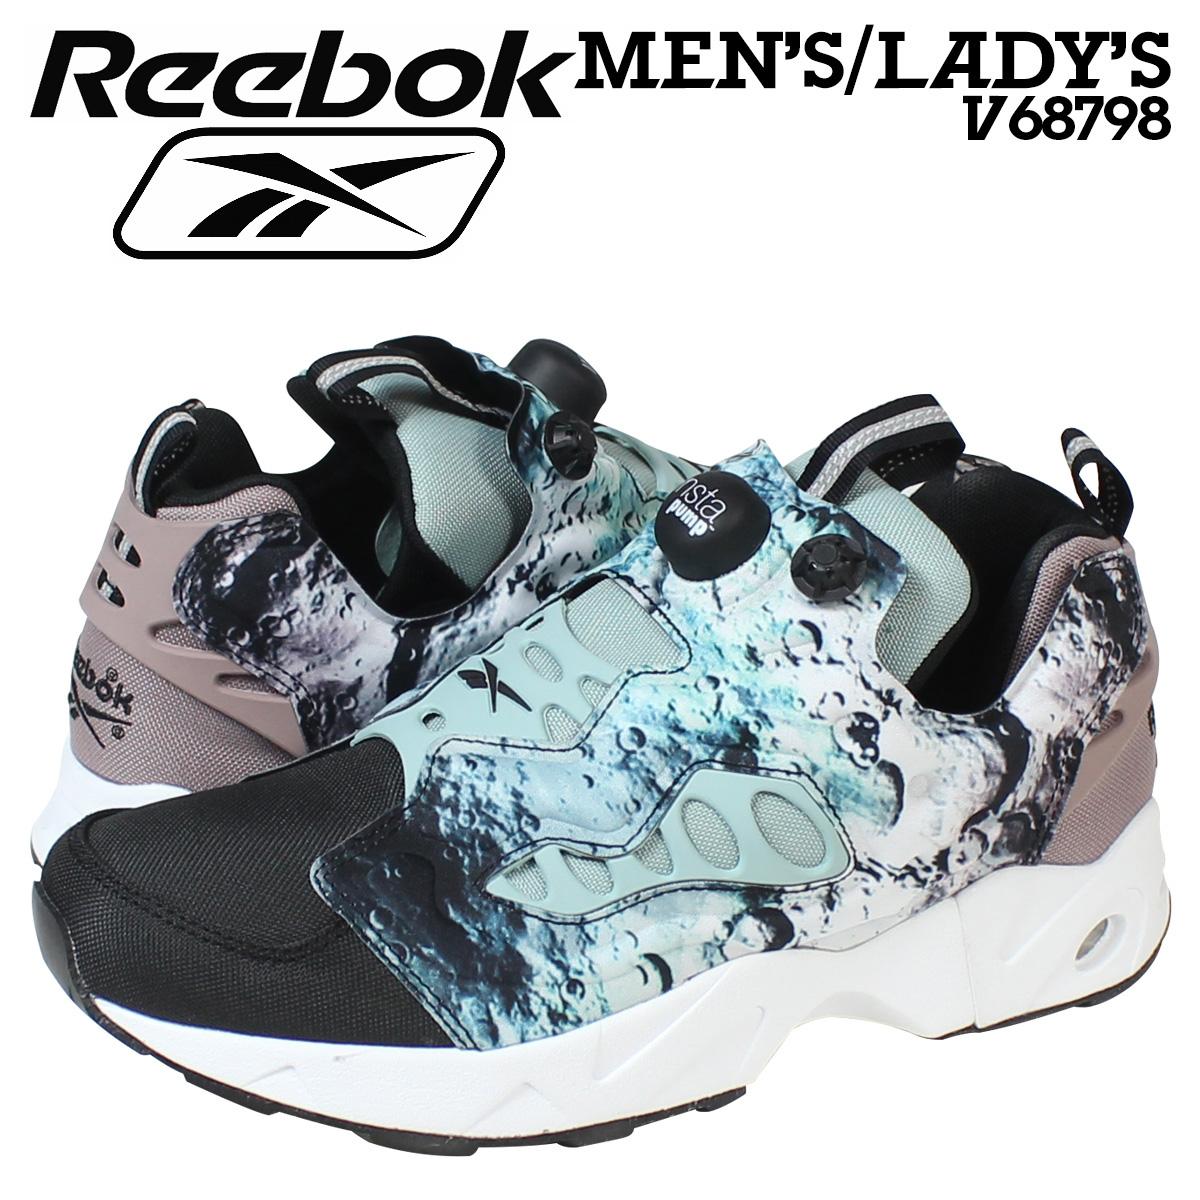 Whats up Sports  Reebok Reebok insta pump fury sneakers INSTAPUMP ... 294e48f19